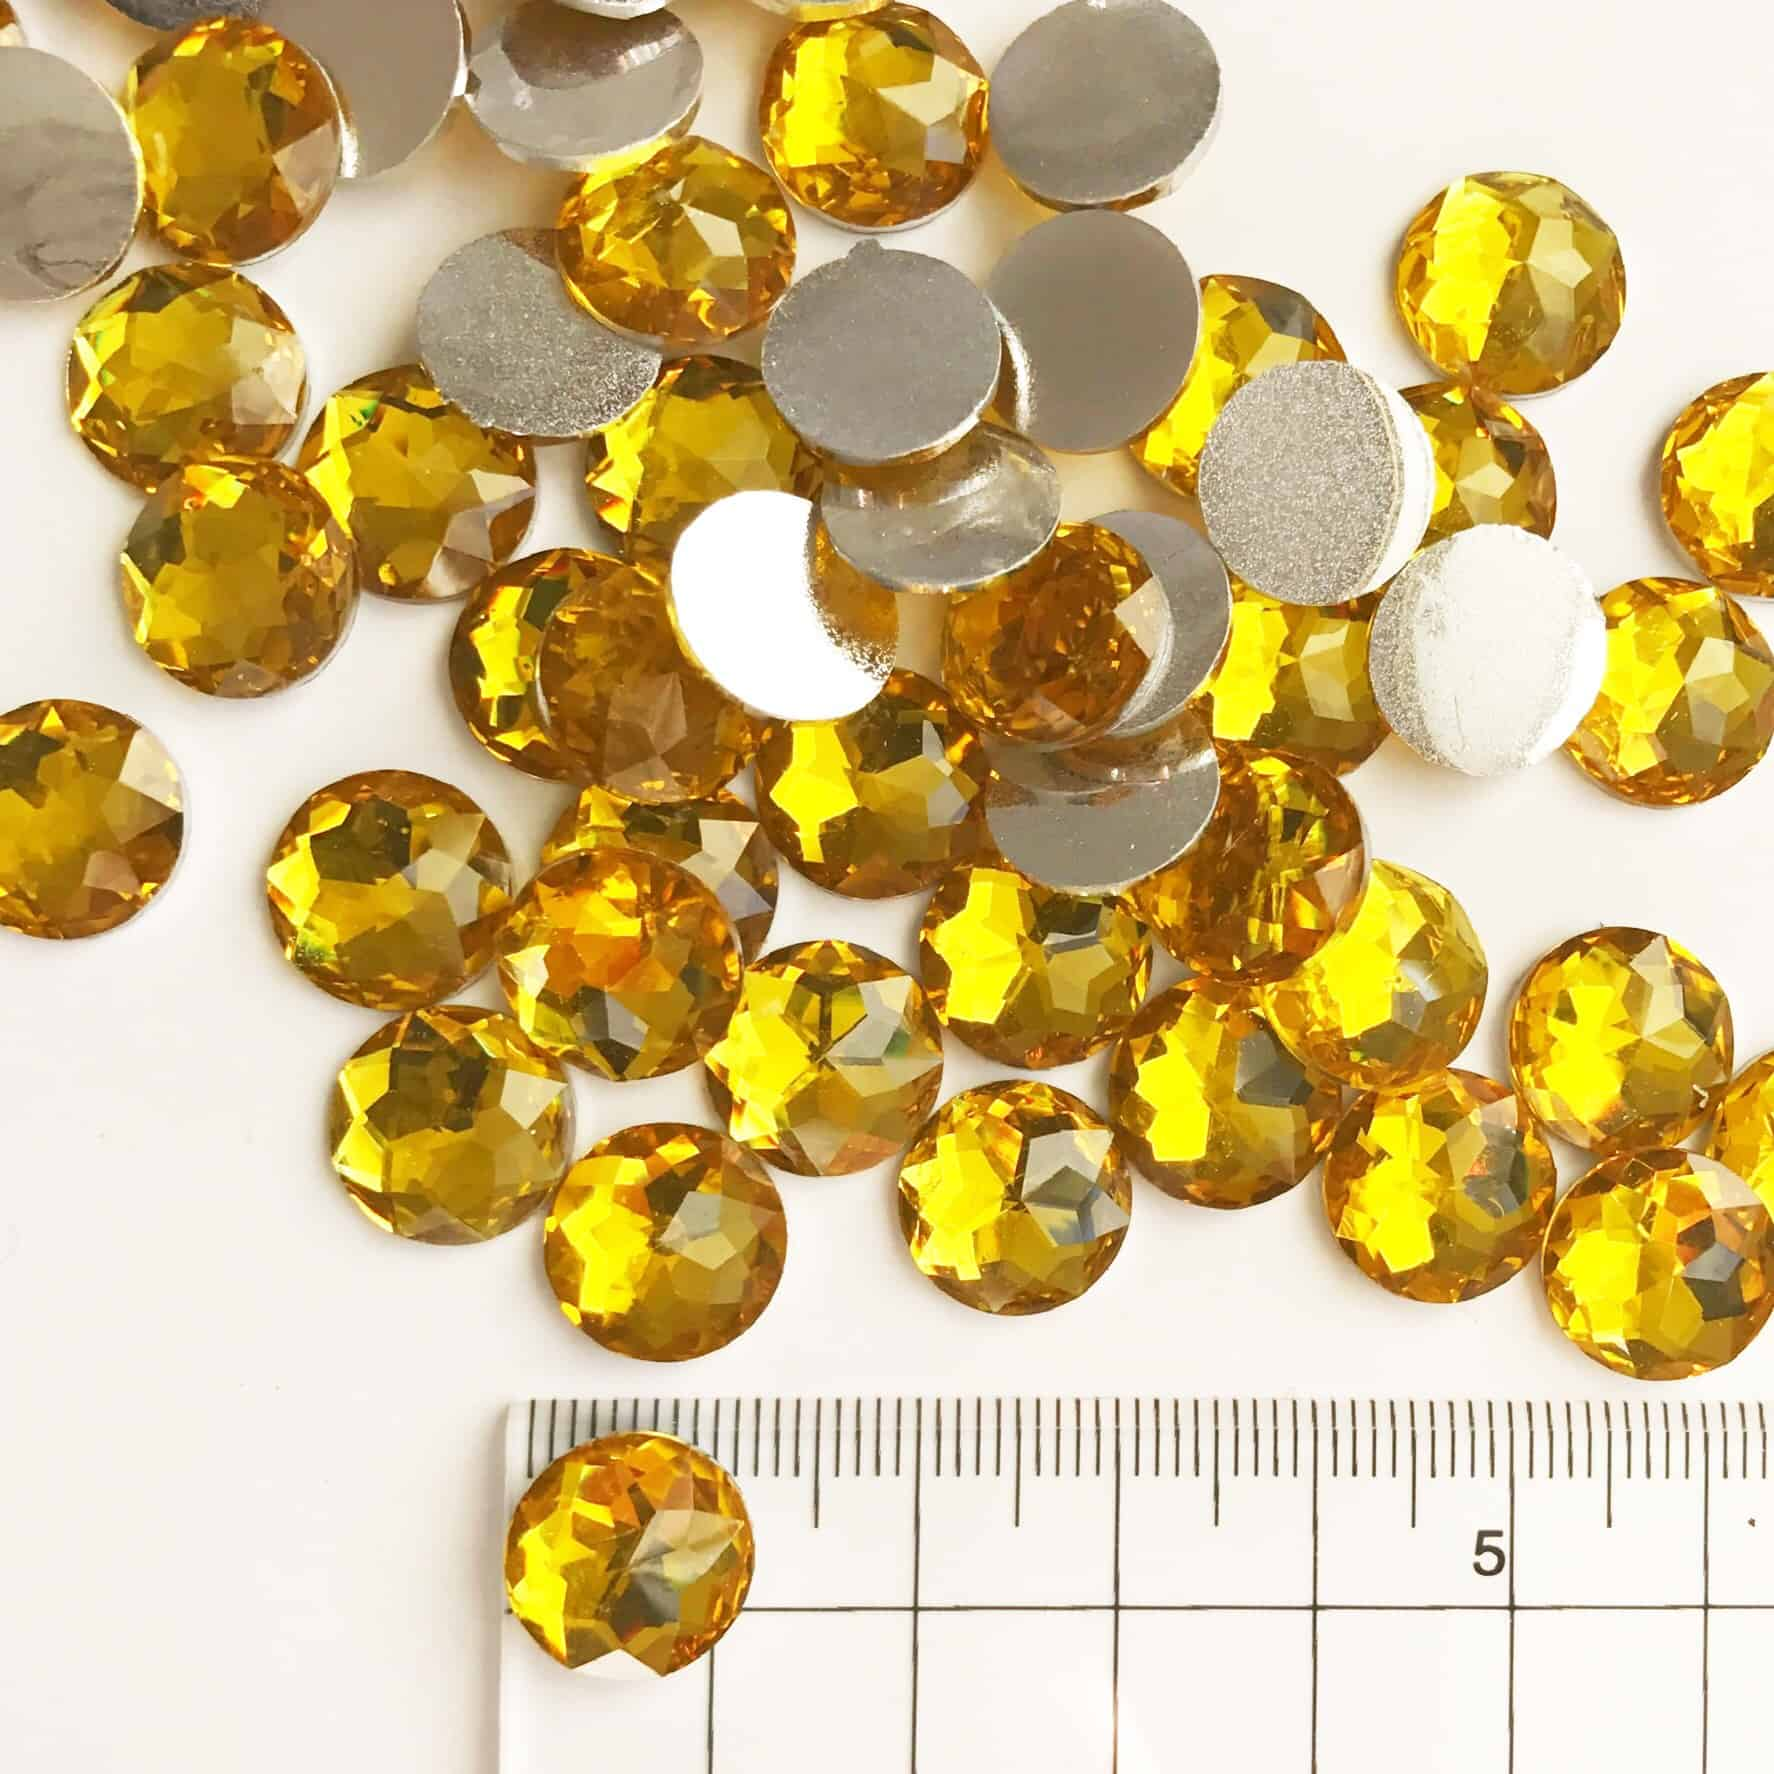 12mm Round Yellow Acrylic Gem Stones (Pack of 300)